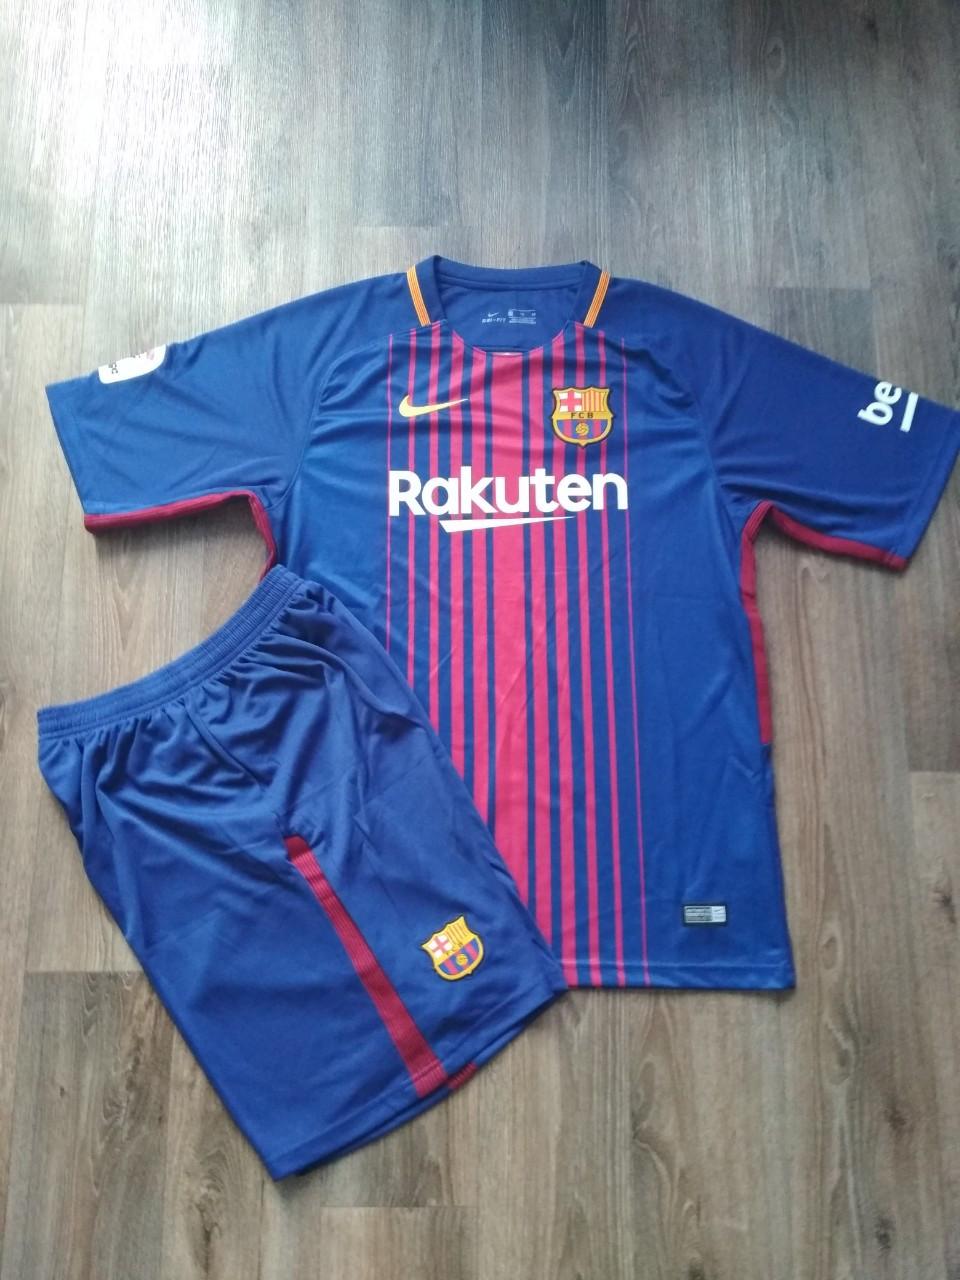 Футбольная форма Барселона сезон 2017-2018 основная гранатовая (XL)  Распродажа 27208b49083